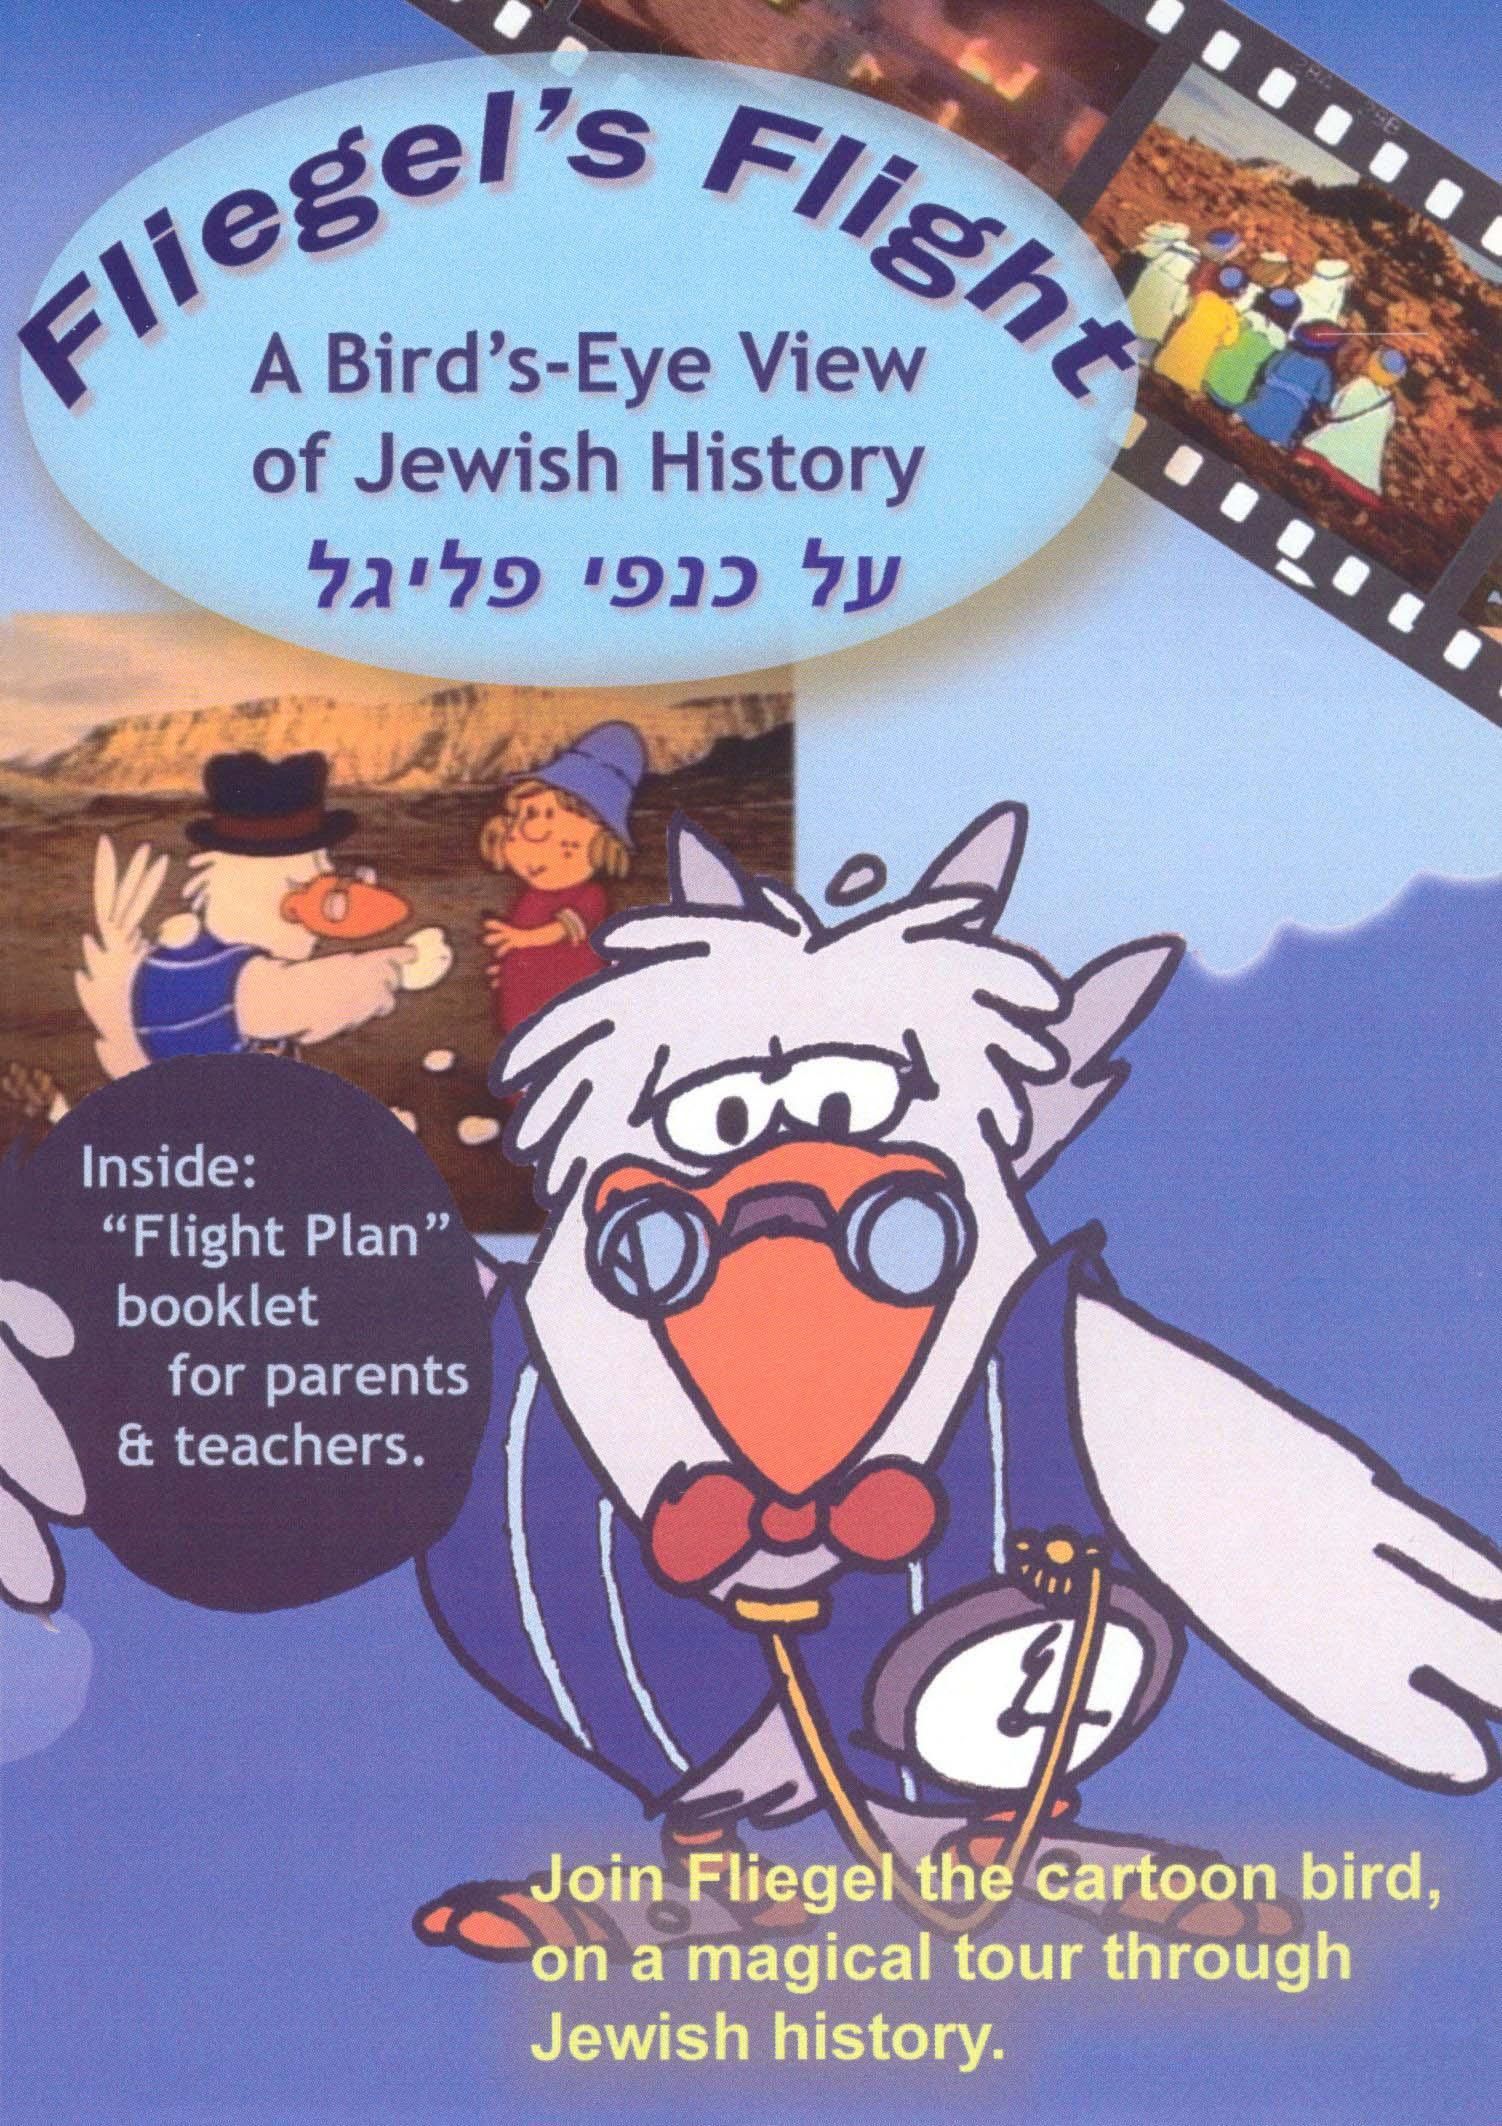 Fliegel's Flight